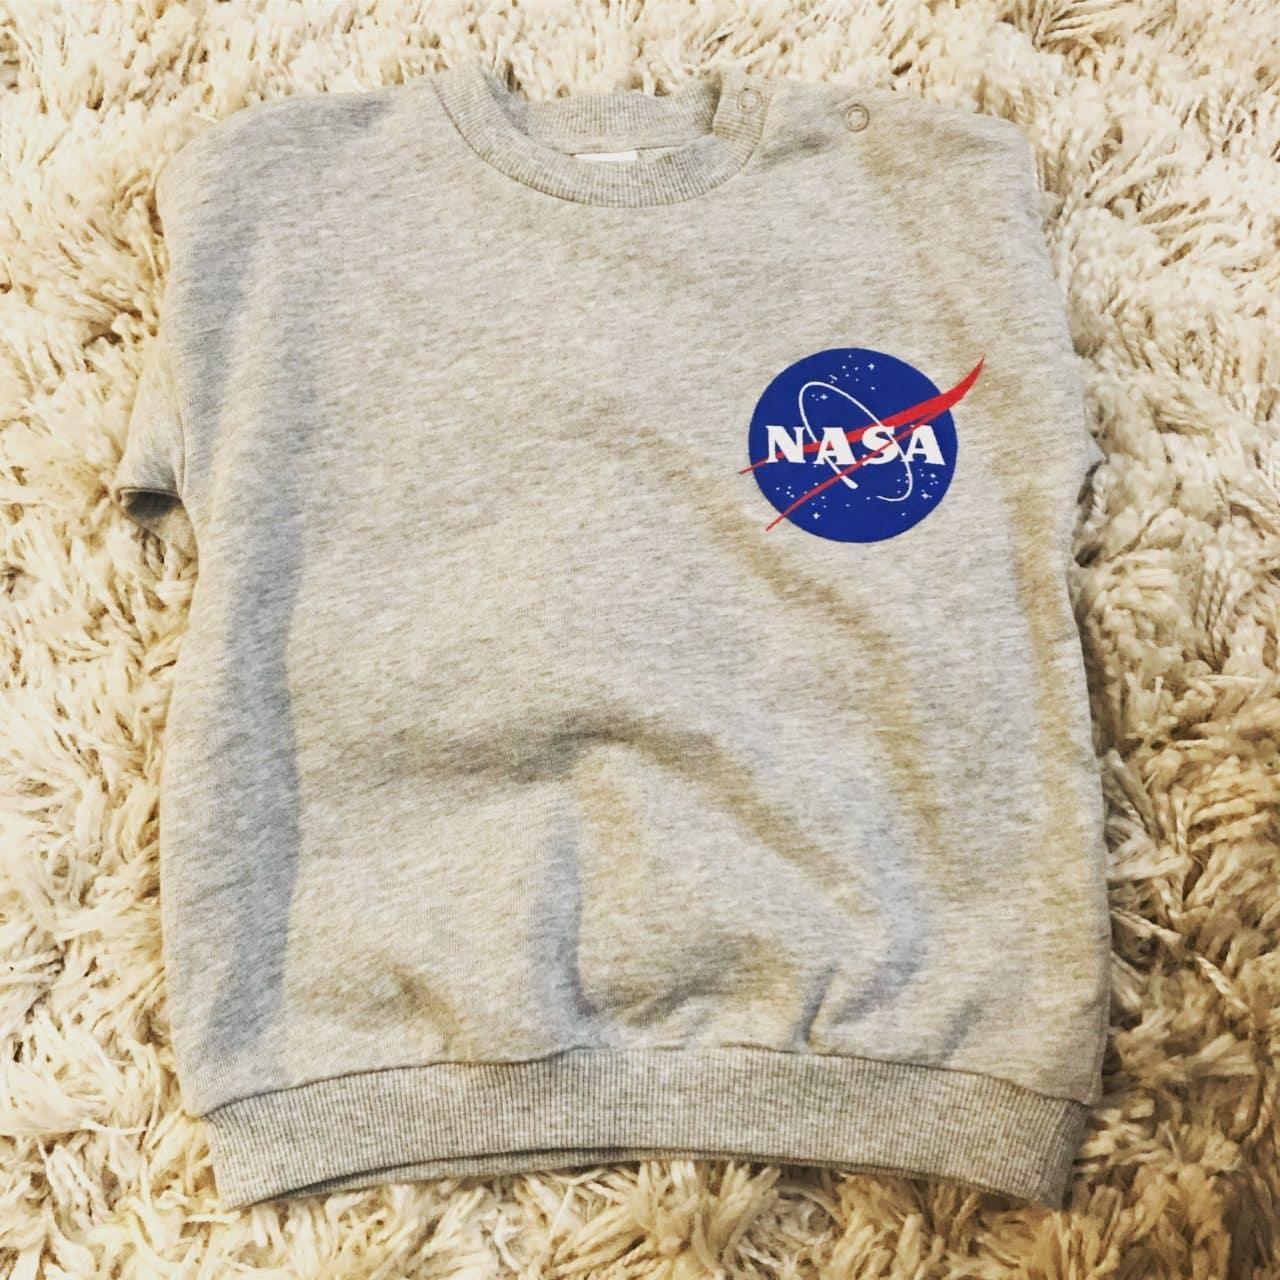 Gray Kid's NASA Sweater Laying On A Rug